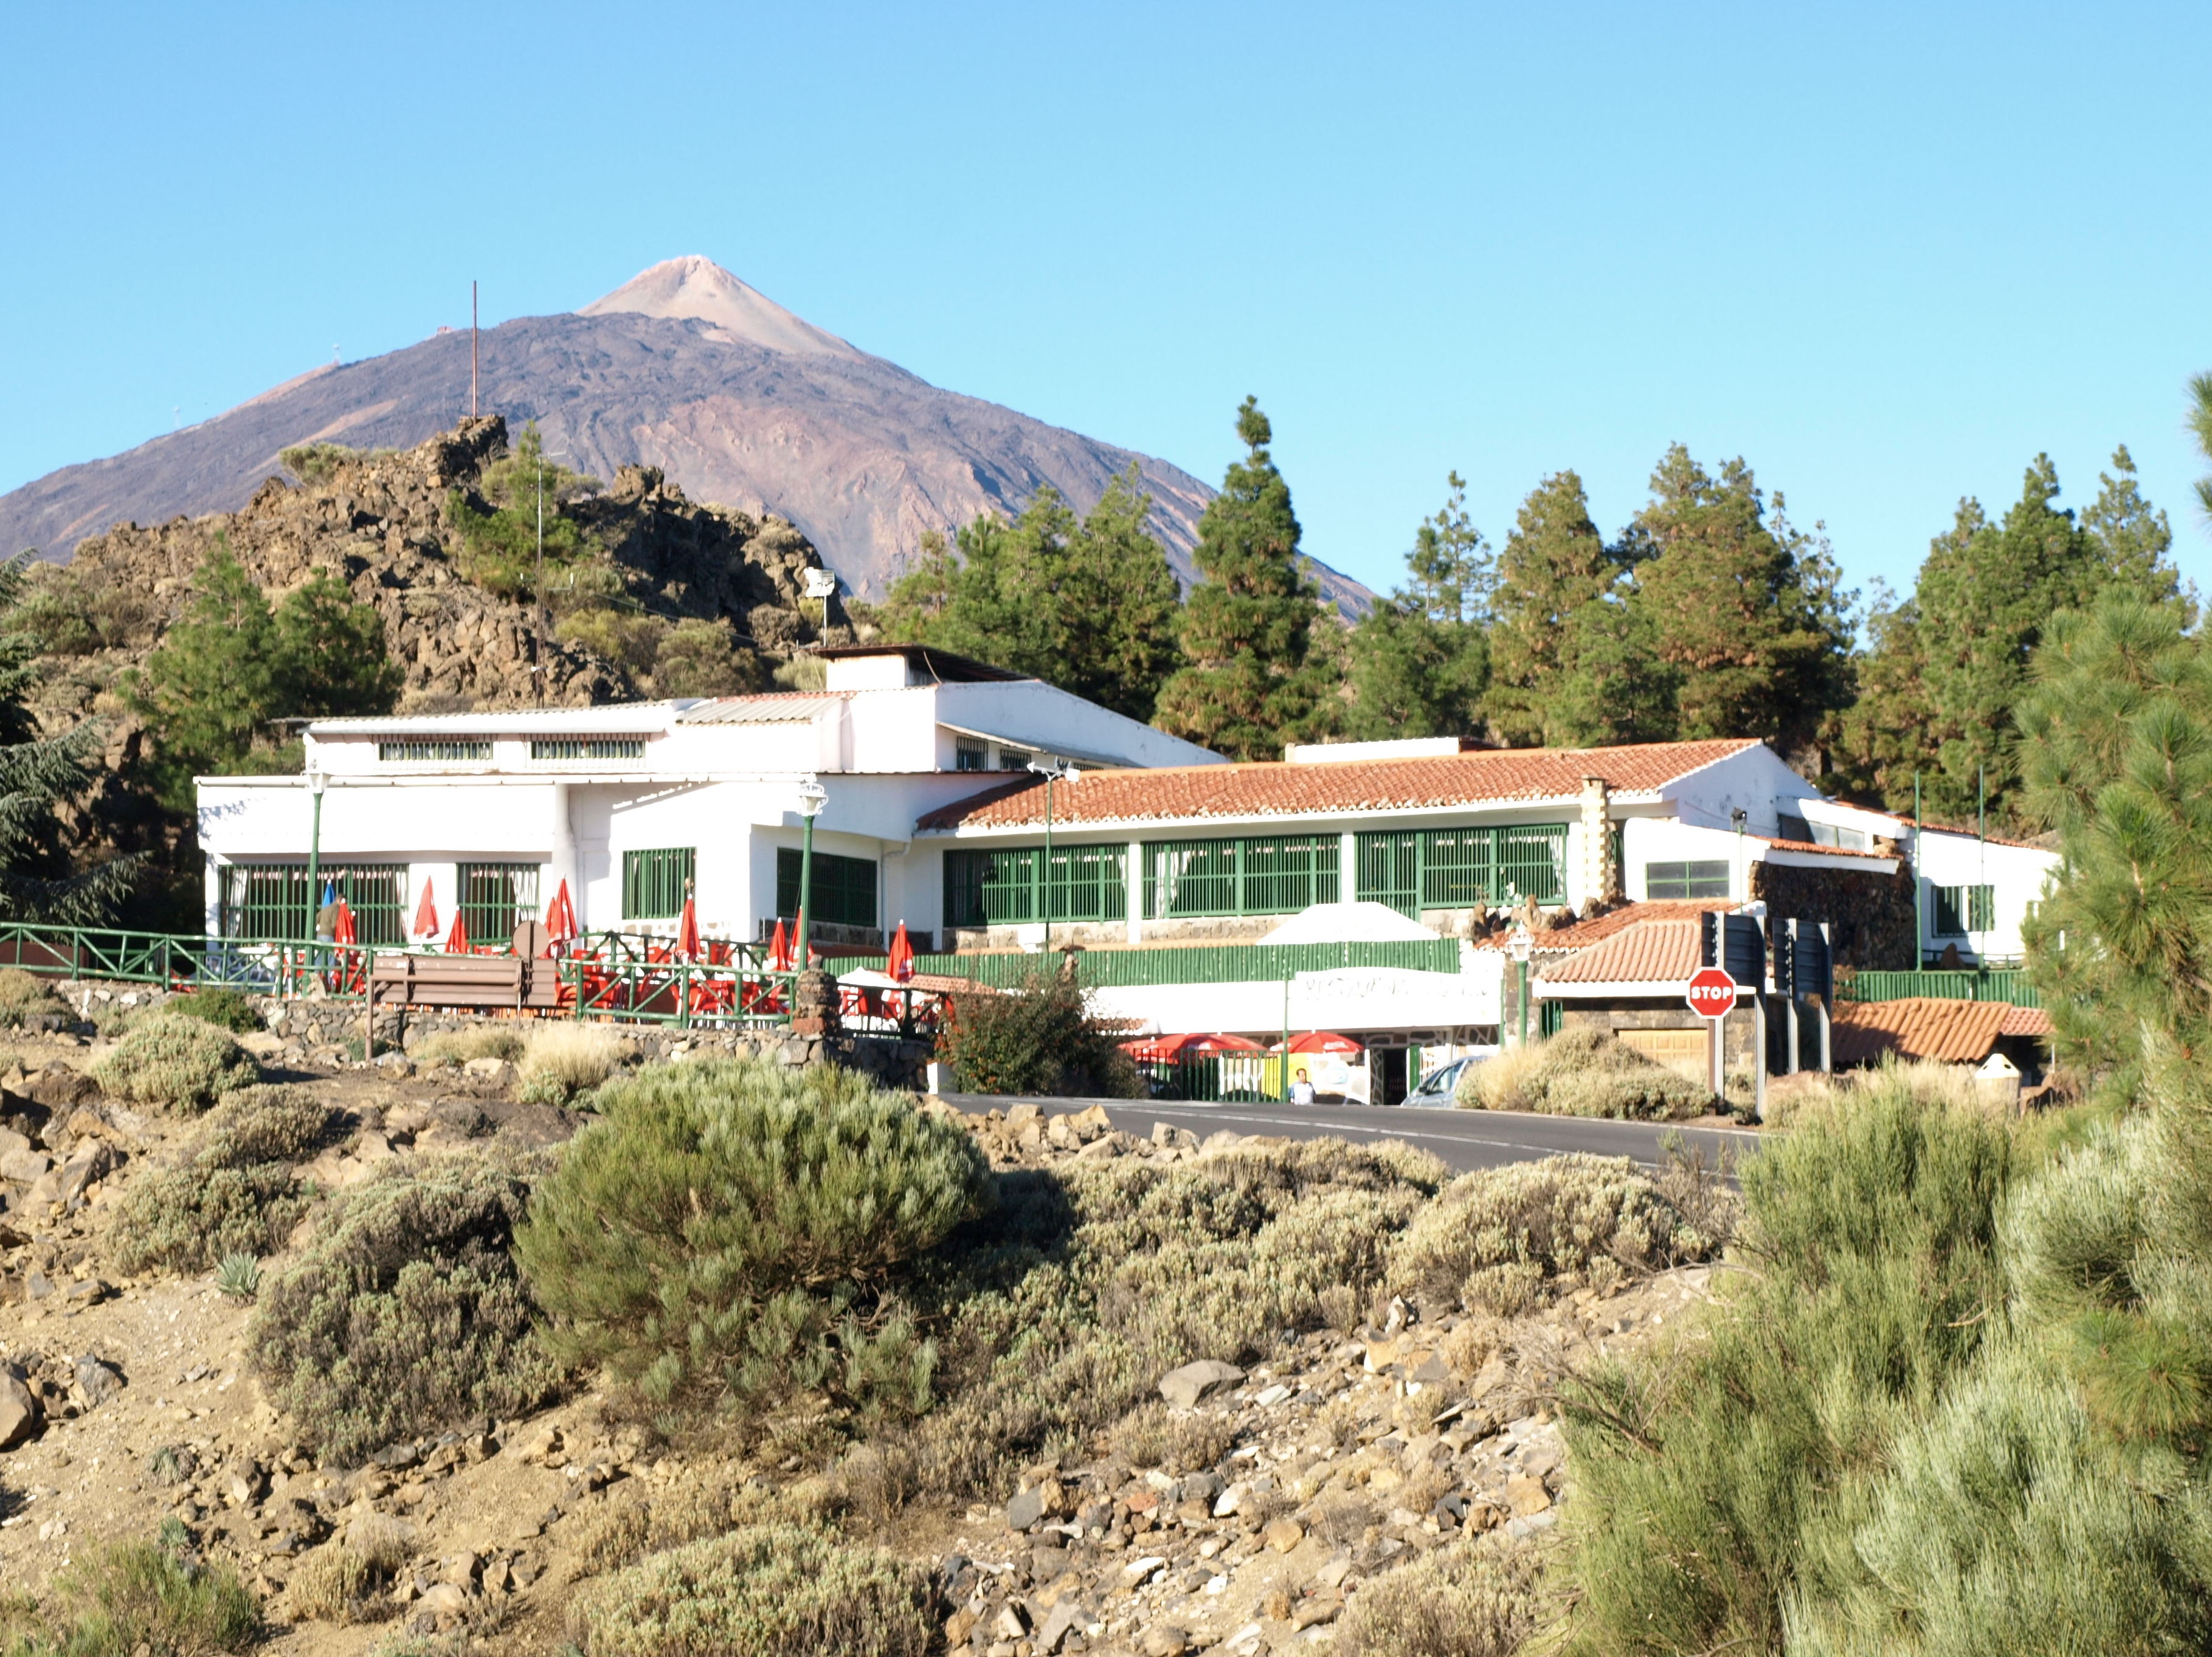 Vista exterior del restaurante El Portillo